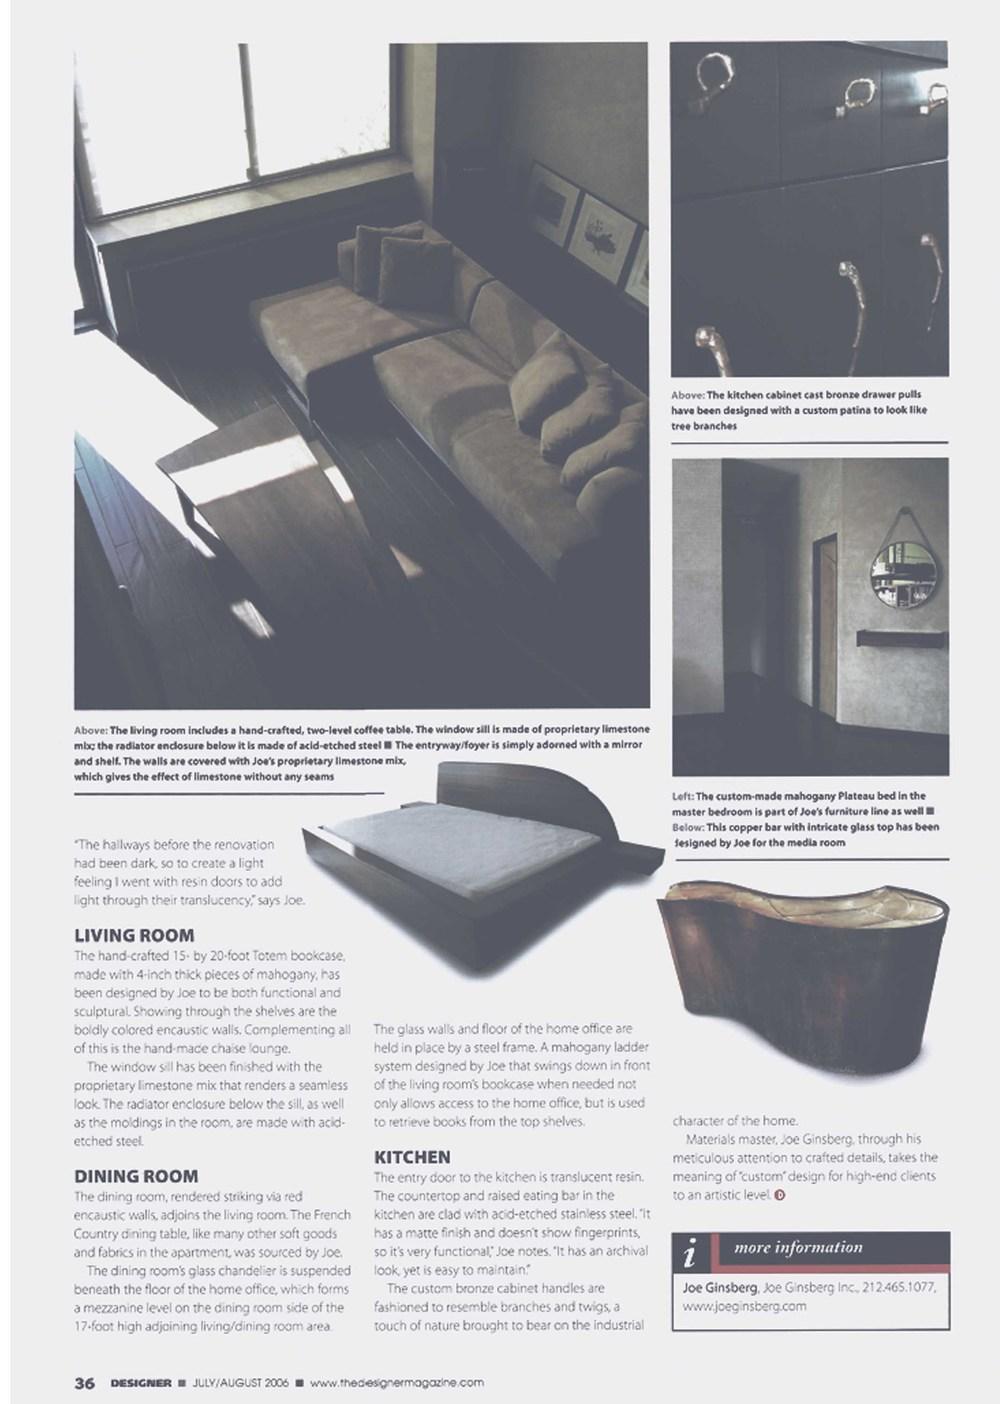 NYC Interior Designer | Joe Ginsberg Design